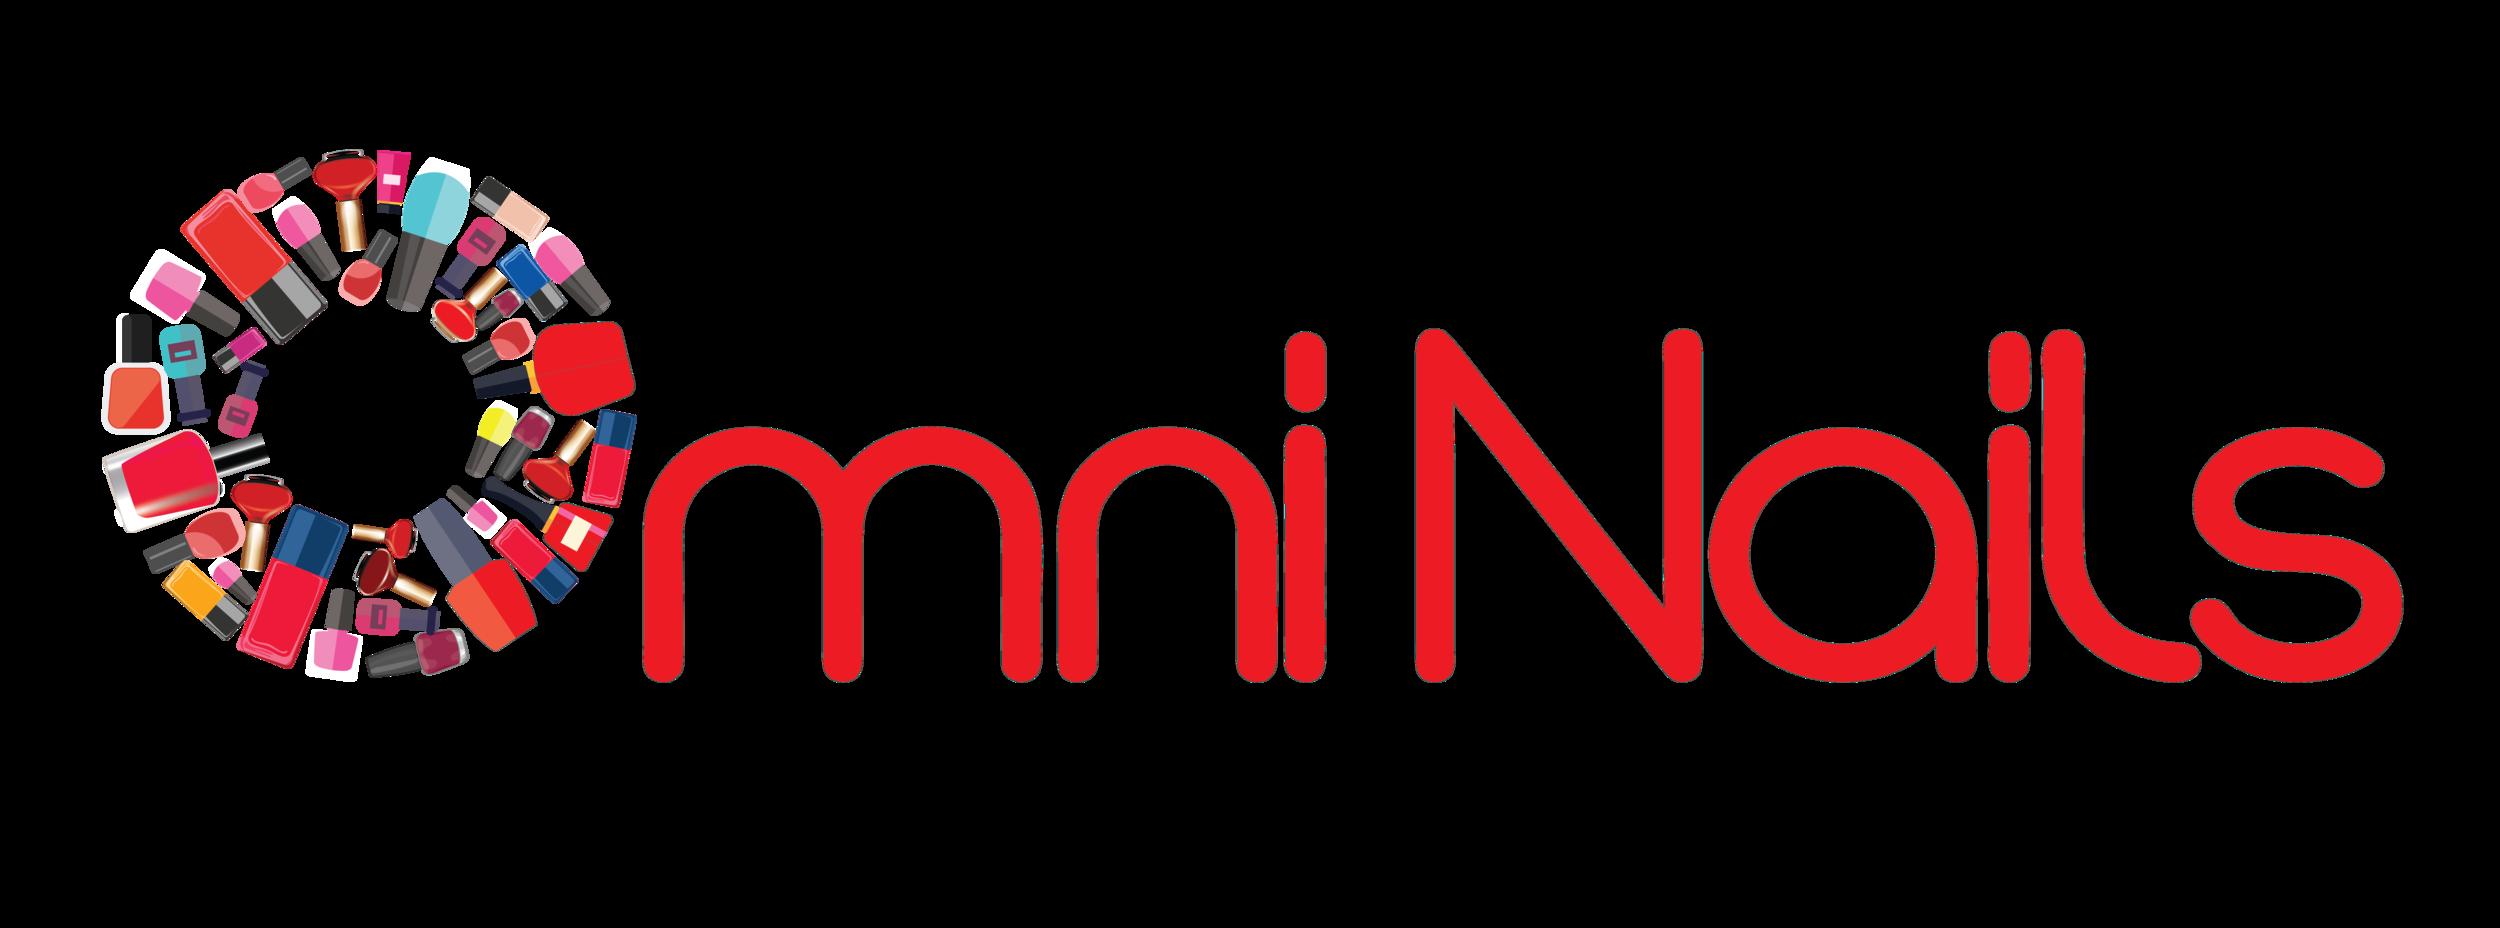 OMNI NAILS-01.png